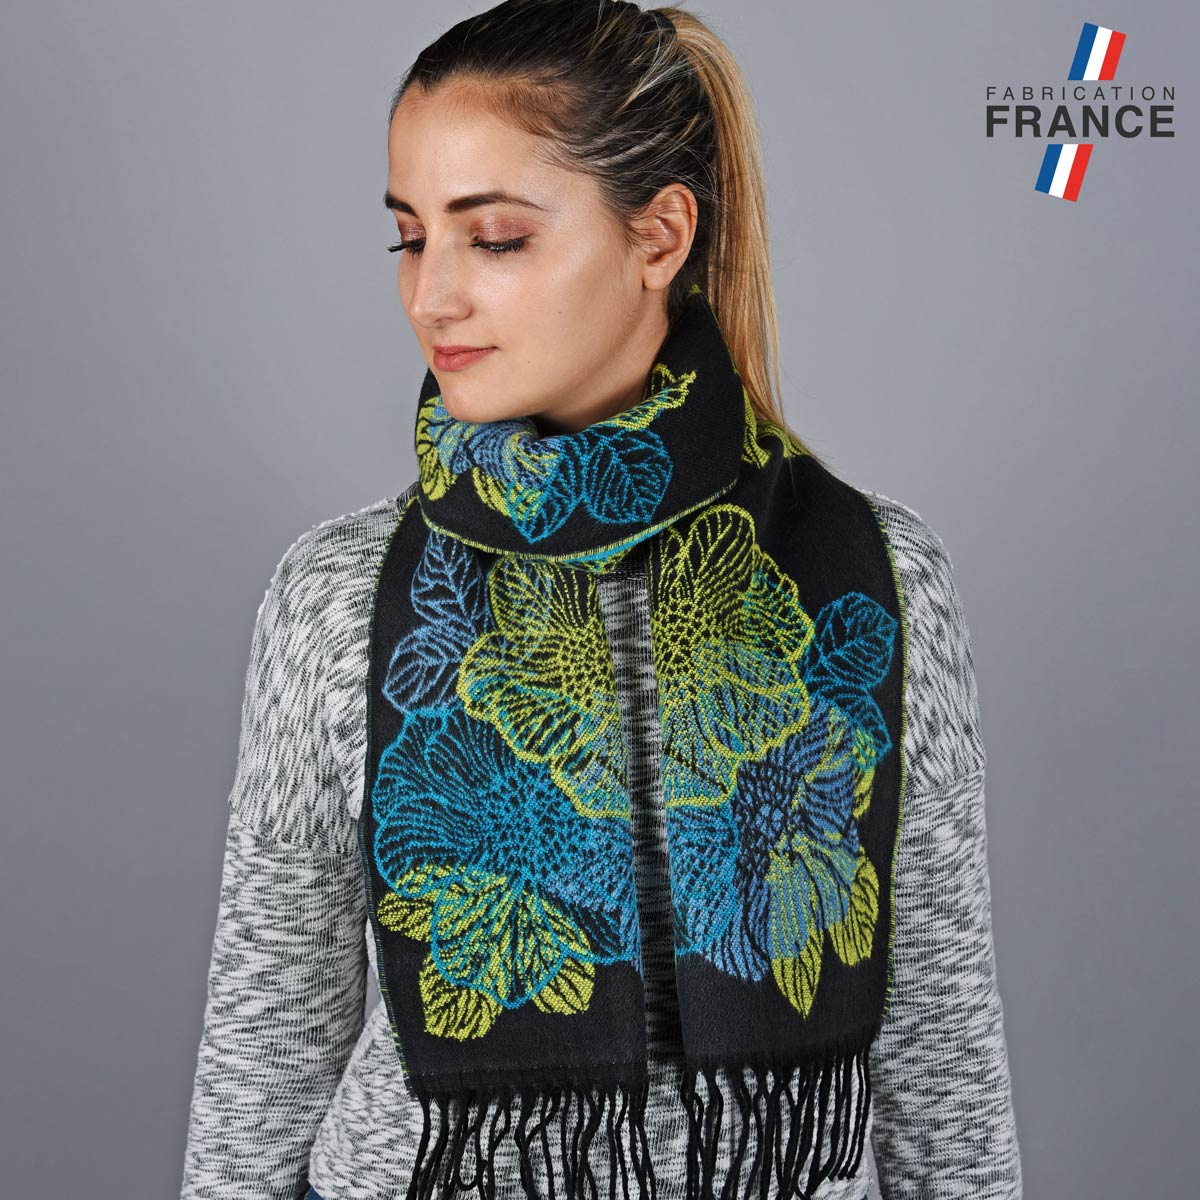 AT-05643_W12-1FR_Echarpe-femme-noir-vert-label-francais